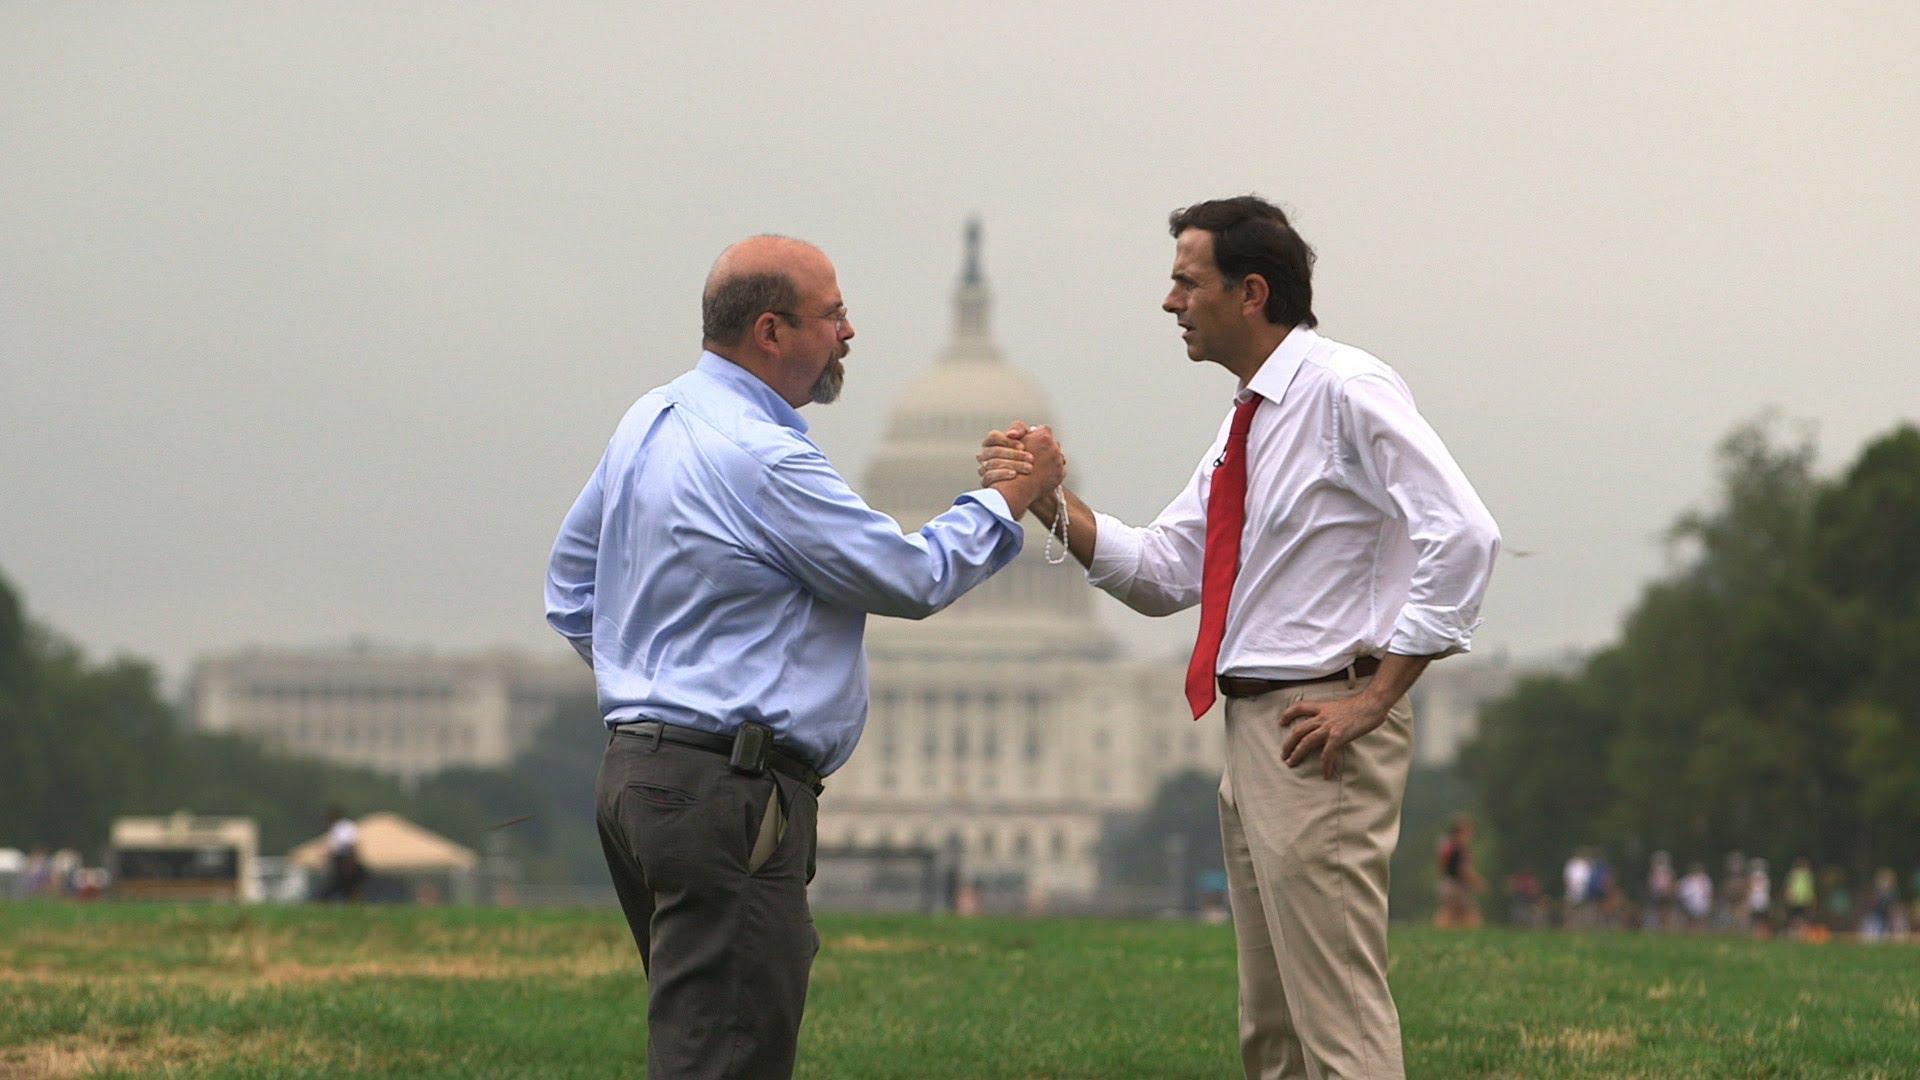 Coloquio con Juan Manuel Cotelo, director de la película MARY´S LAND